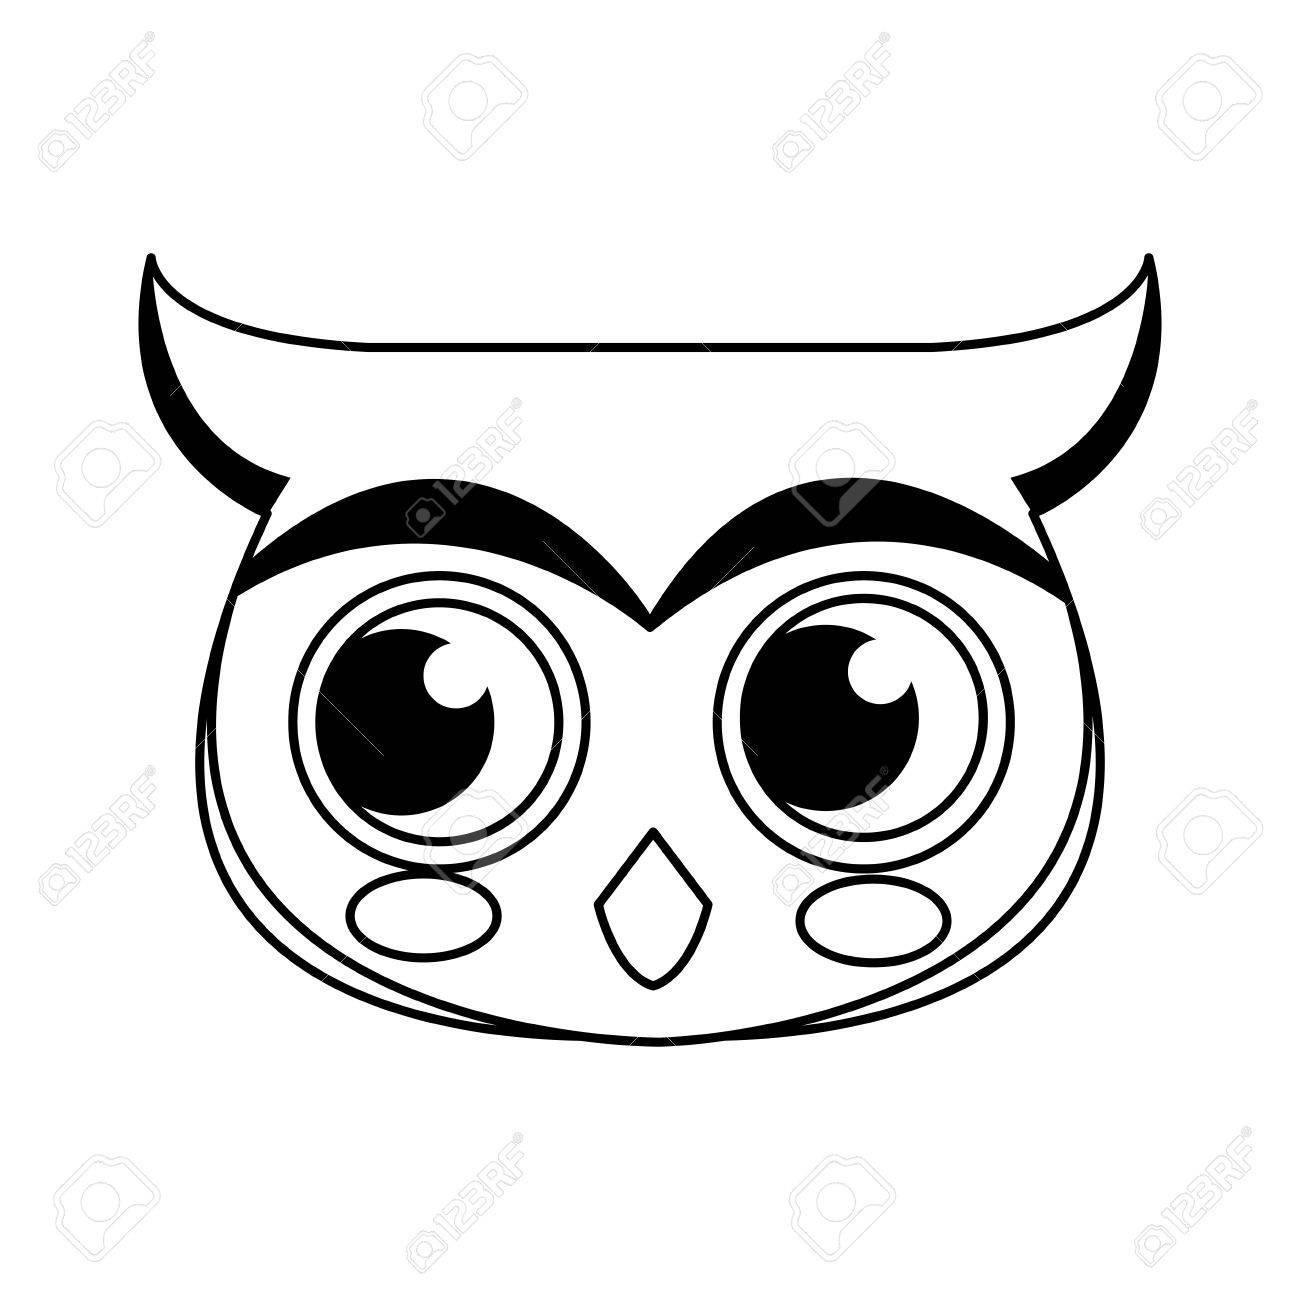 owl-sweet-cartoon-vector-graphic_1360927061335.jpg (335×355) | Owl drawing  simple, Owls drawing, Cute owl drawing